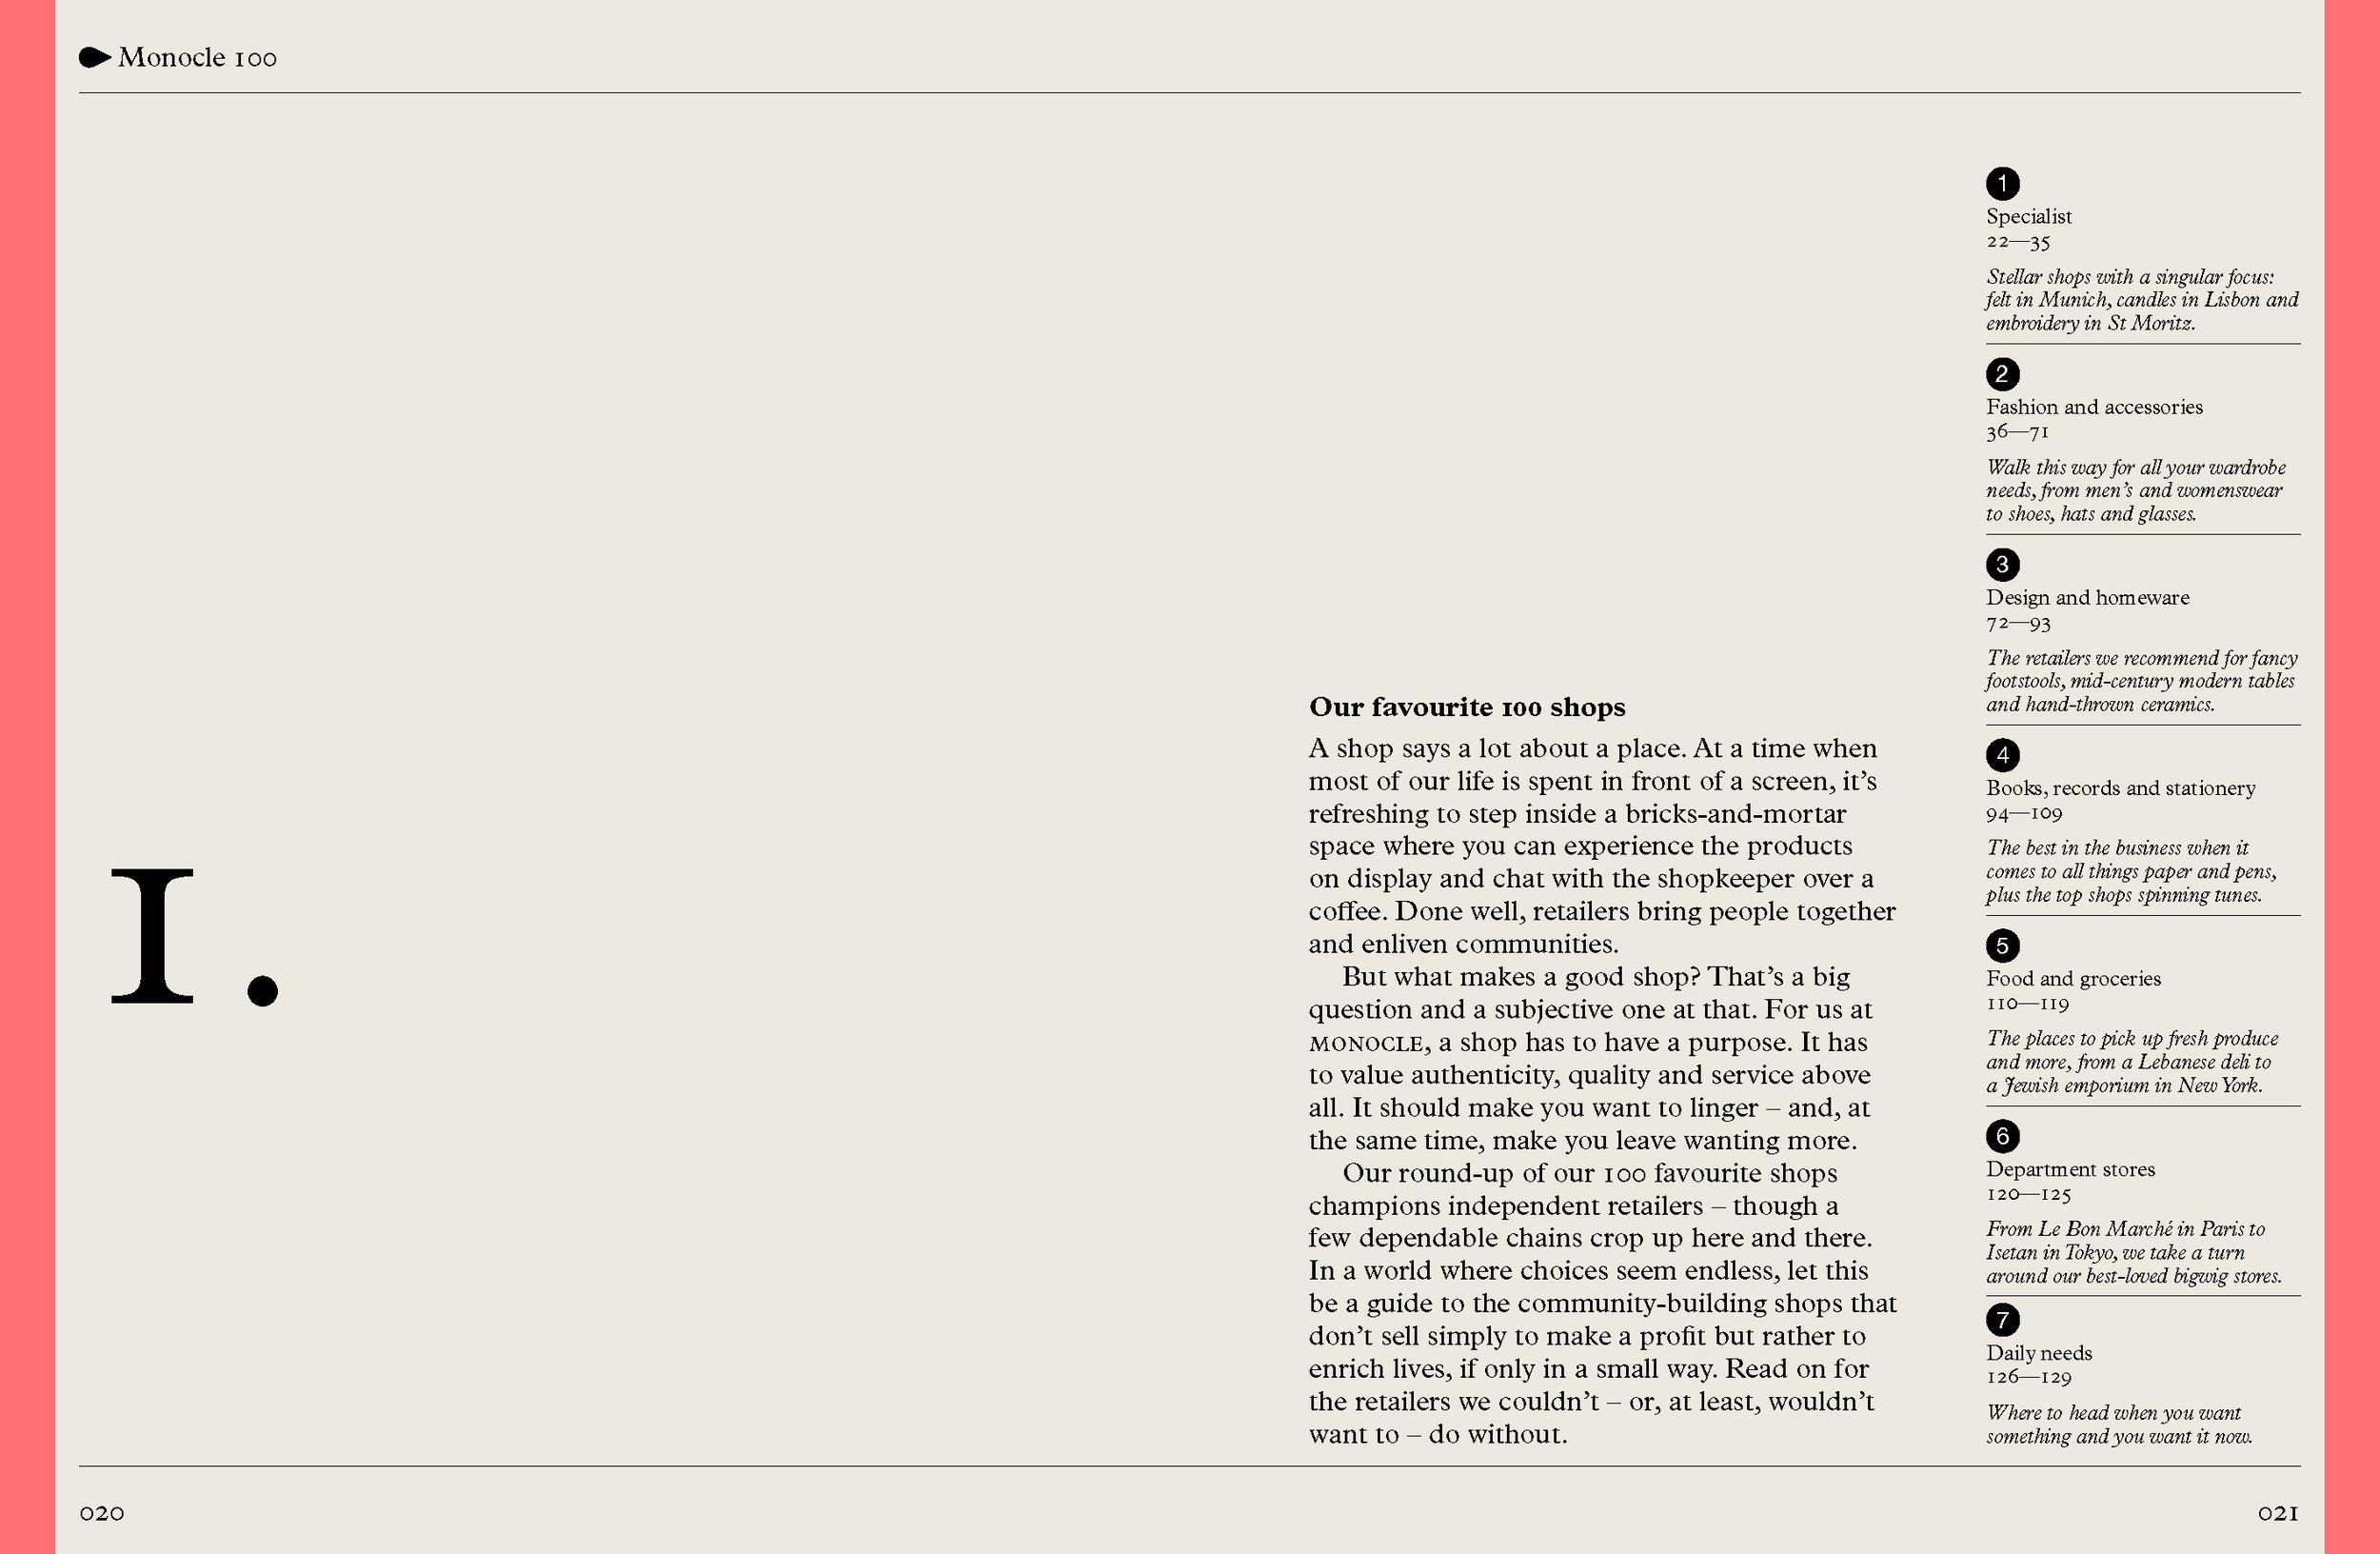 MOCSHO_Monocle 100_Page_02.jpg